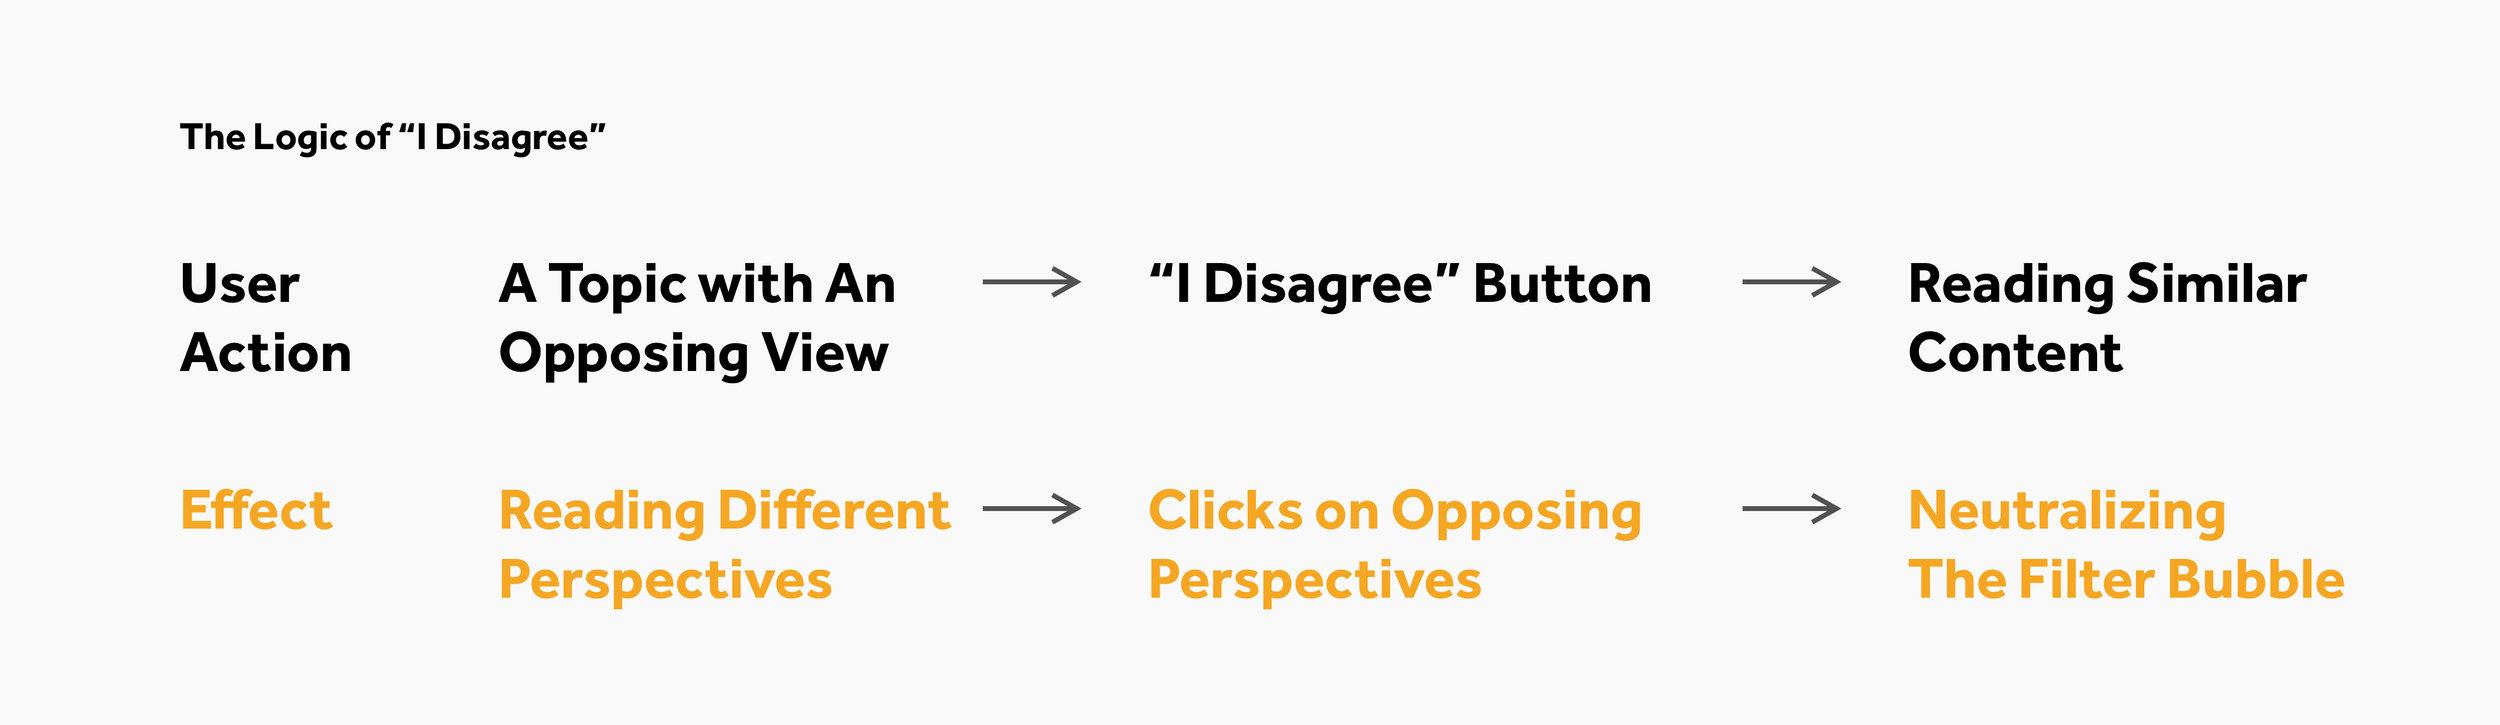 "The Logic of ""I Disagree"".jpg"